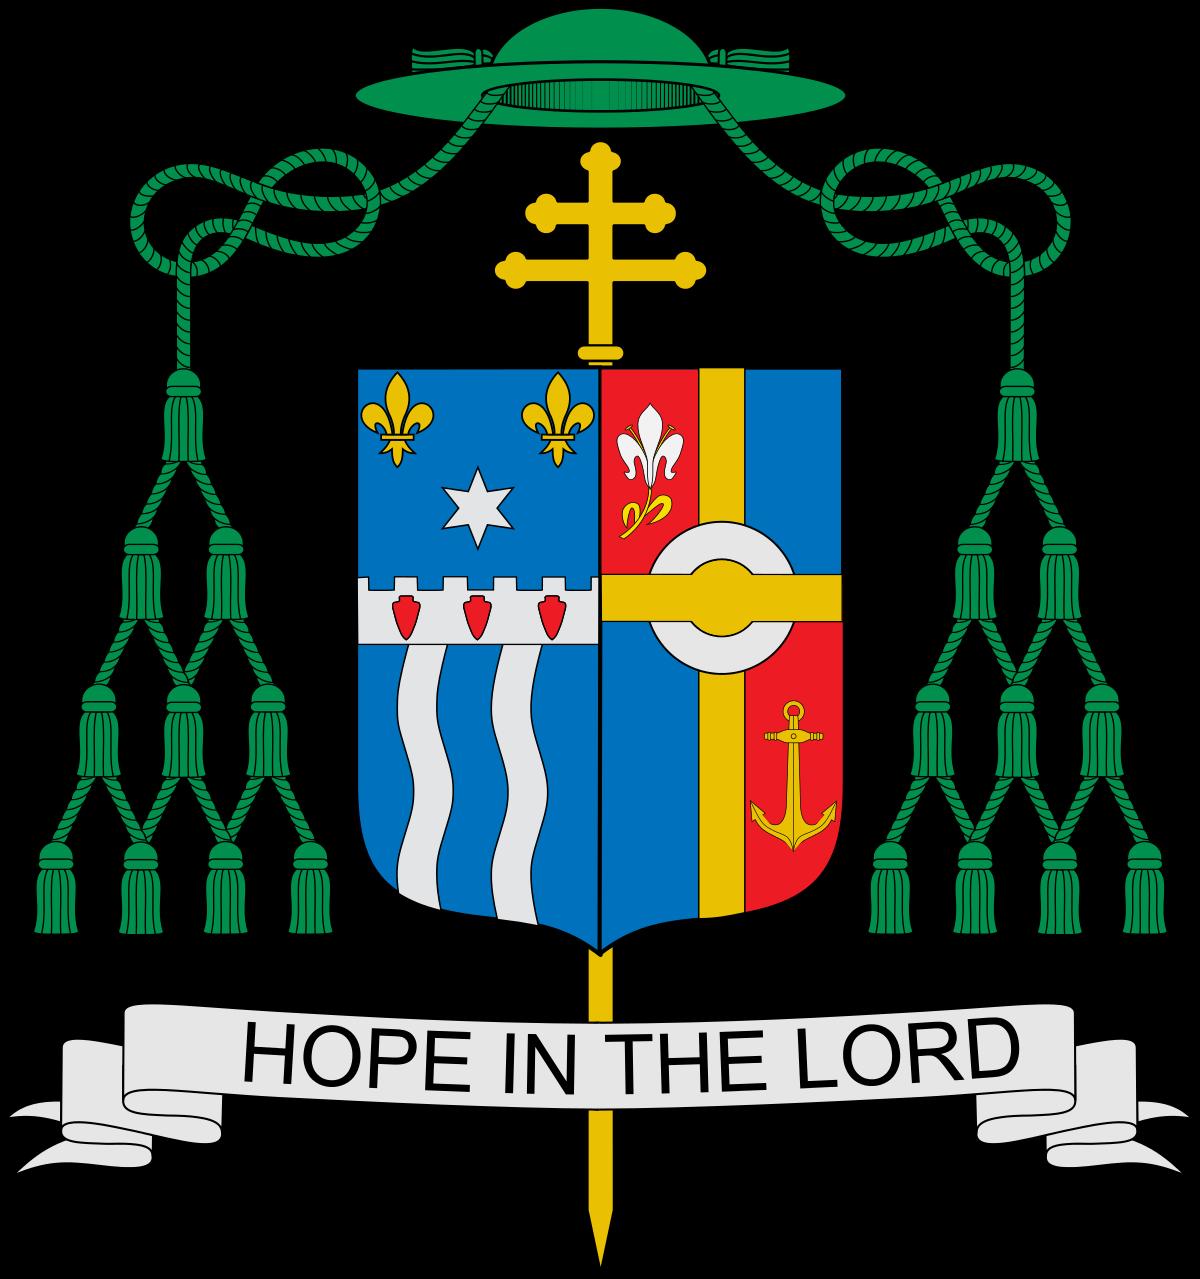 Pastor clipart cleric. Joseph edward kurtz wikipedia